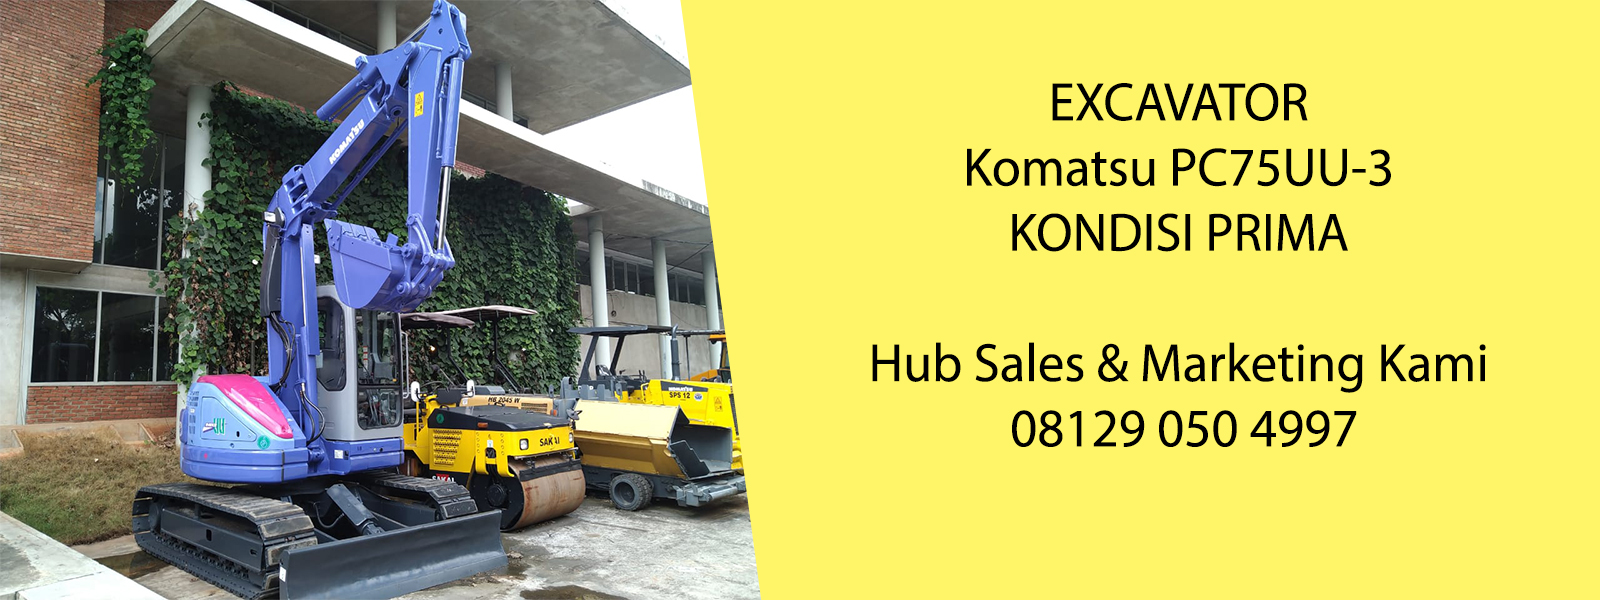 Excavator Komatsu PC75uu-3